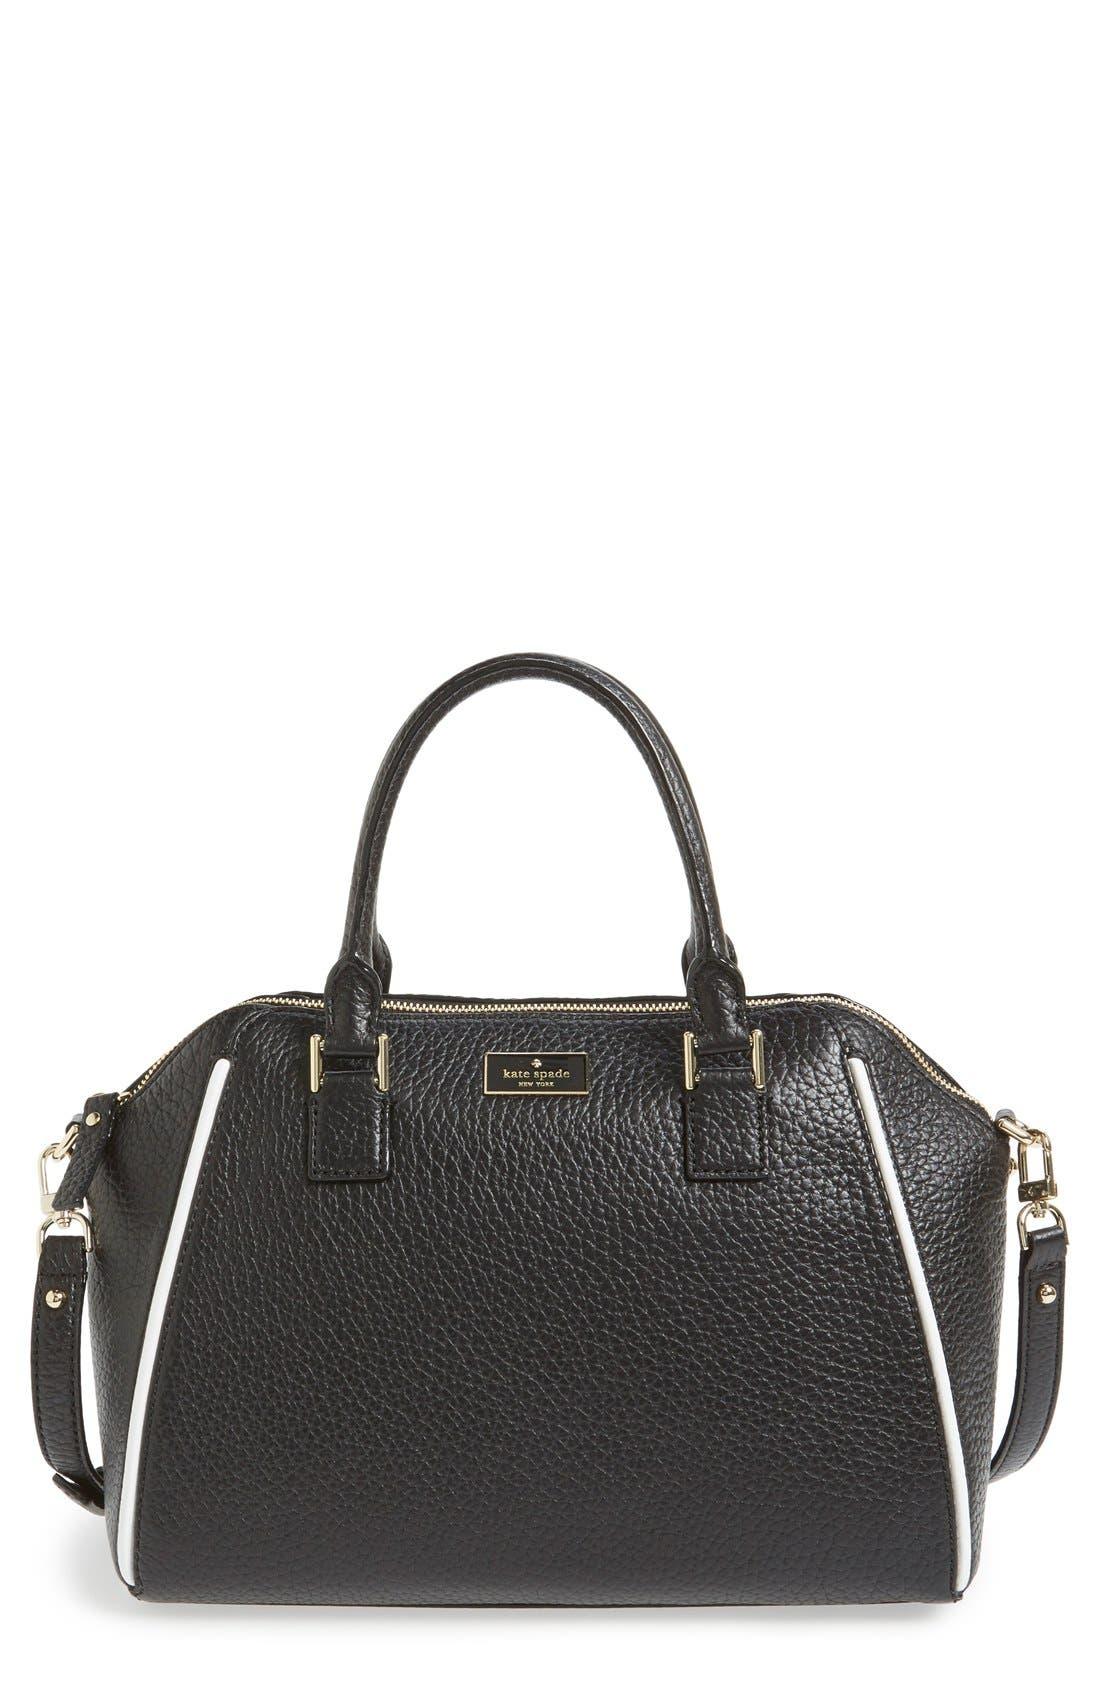 'prospect place - pippa' leather satchel,                             Main thumbnail 1, color,                             001